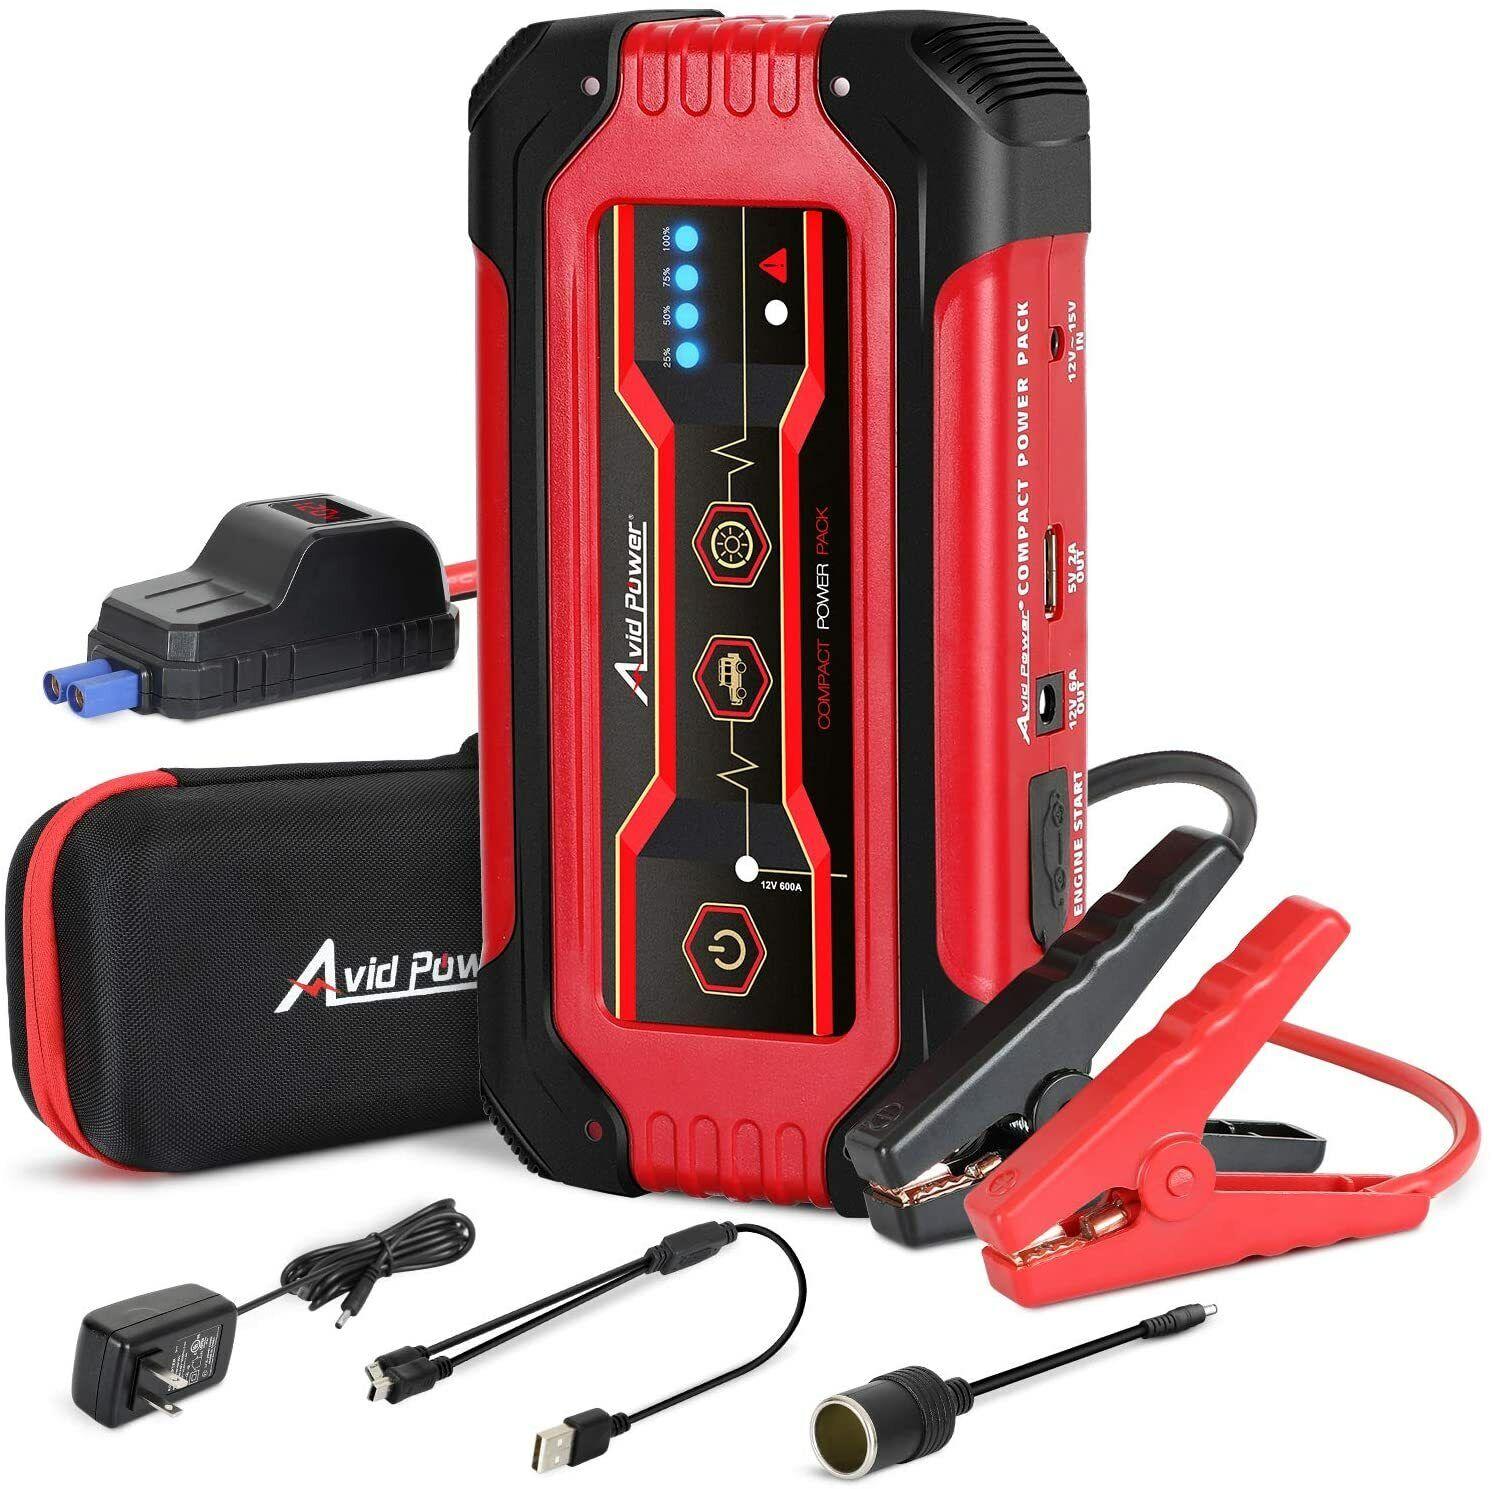 ⚡️ AVID 600A Peak 15,000mAh 12V Portable Car Jump Starter Battery Booster SEALED